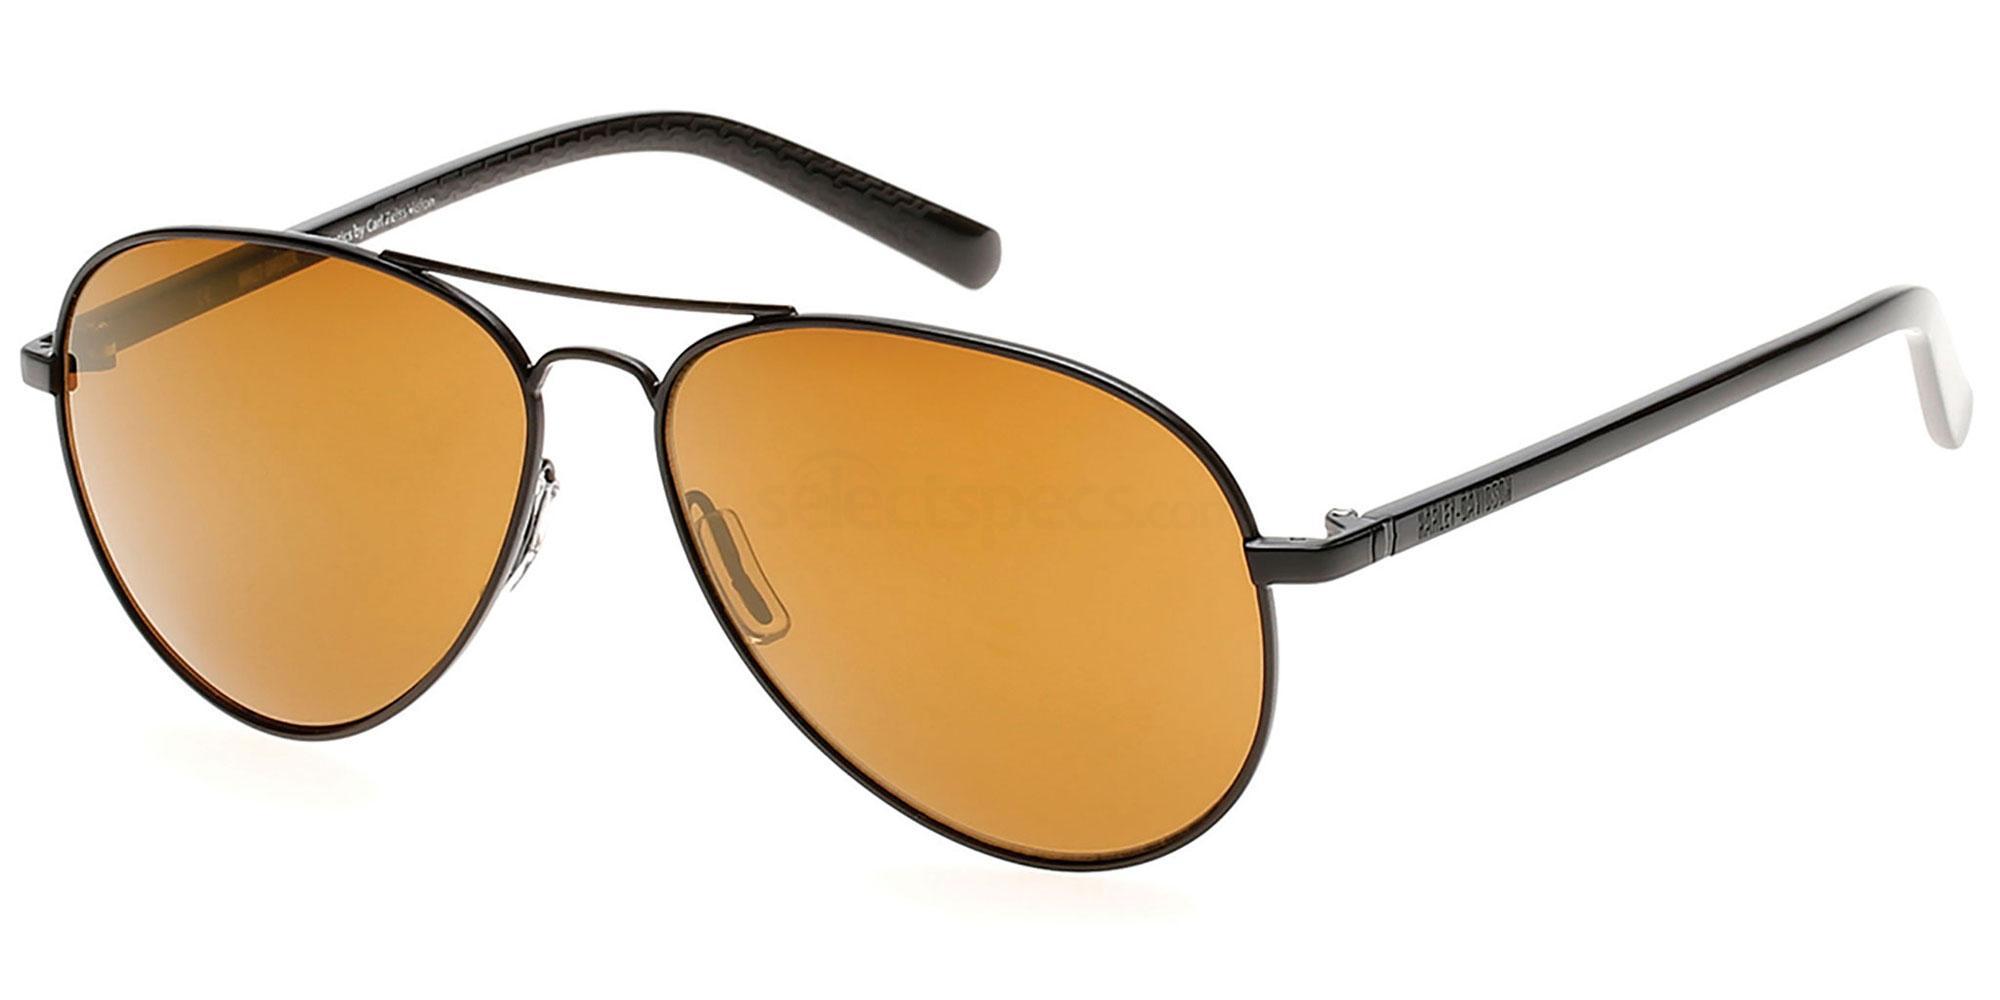 02G HD2013 Sunglasses, Harley Davidson